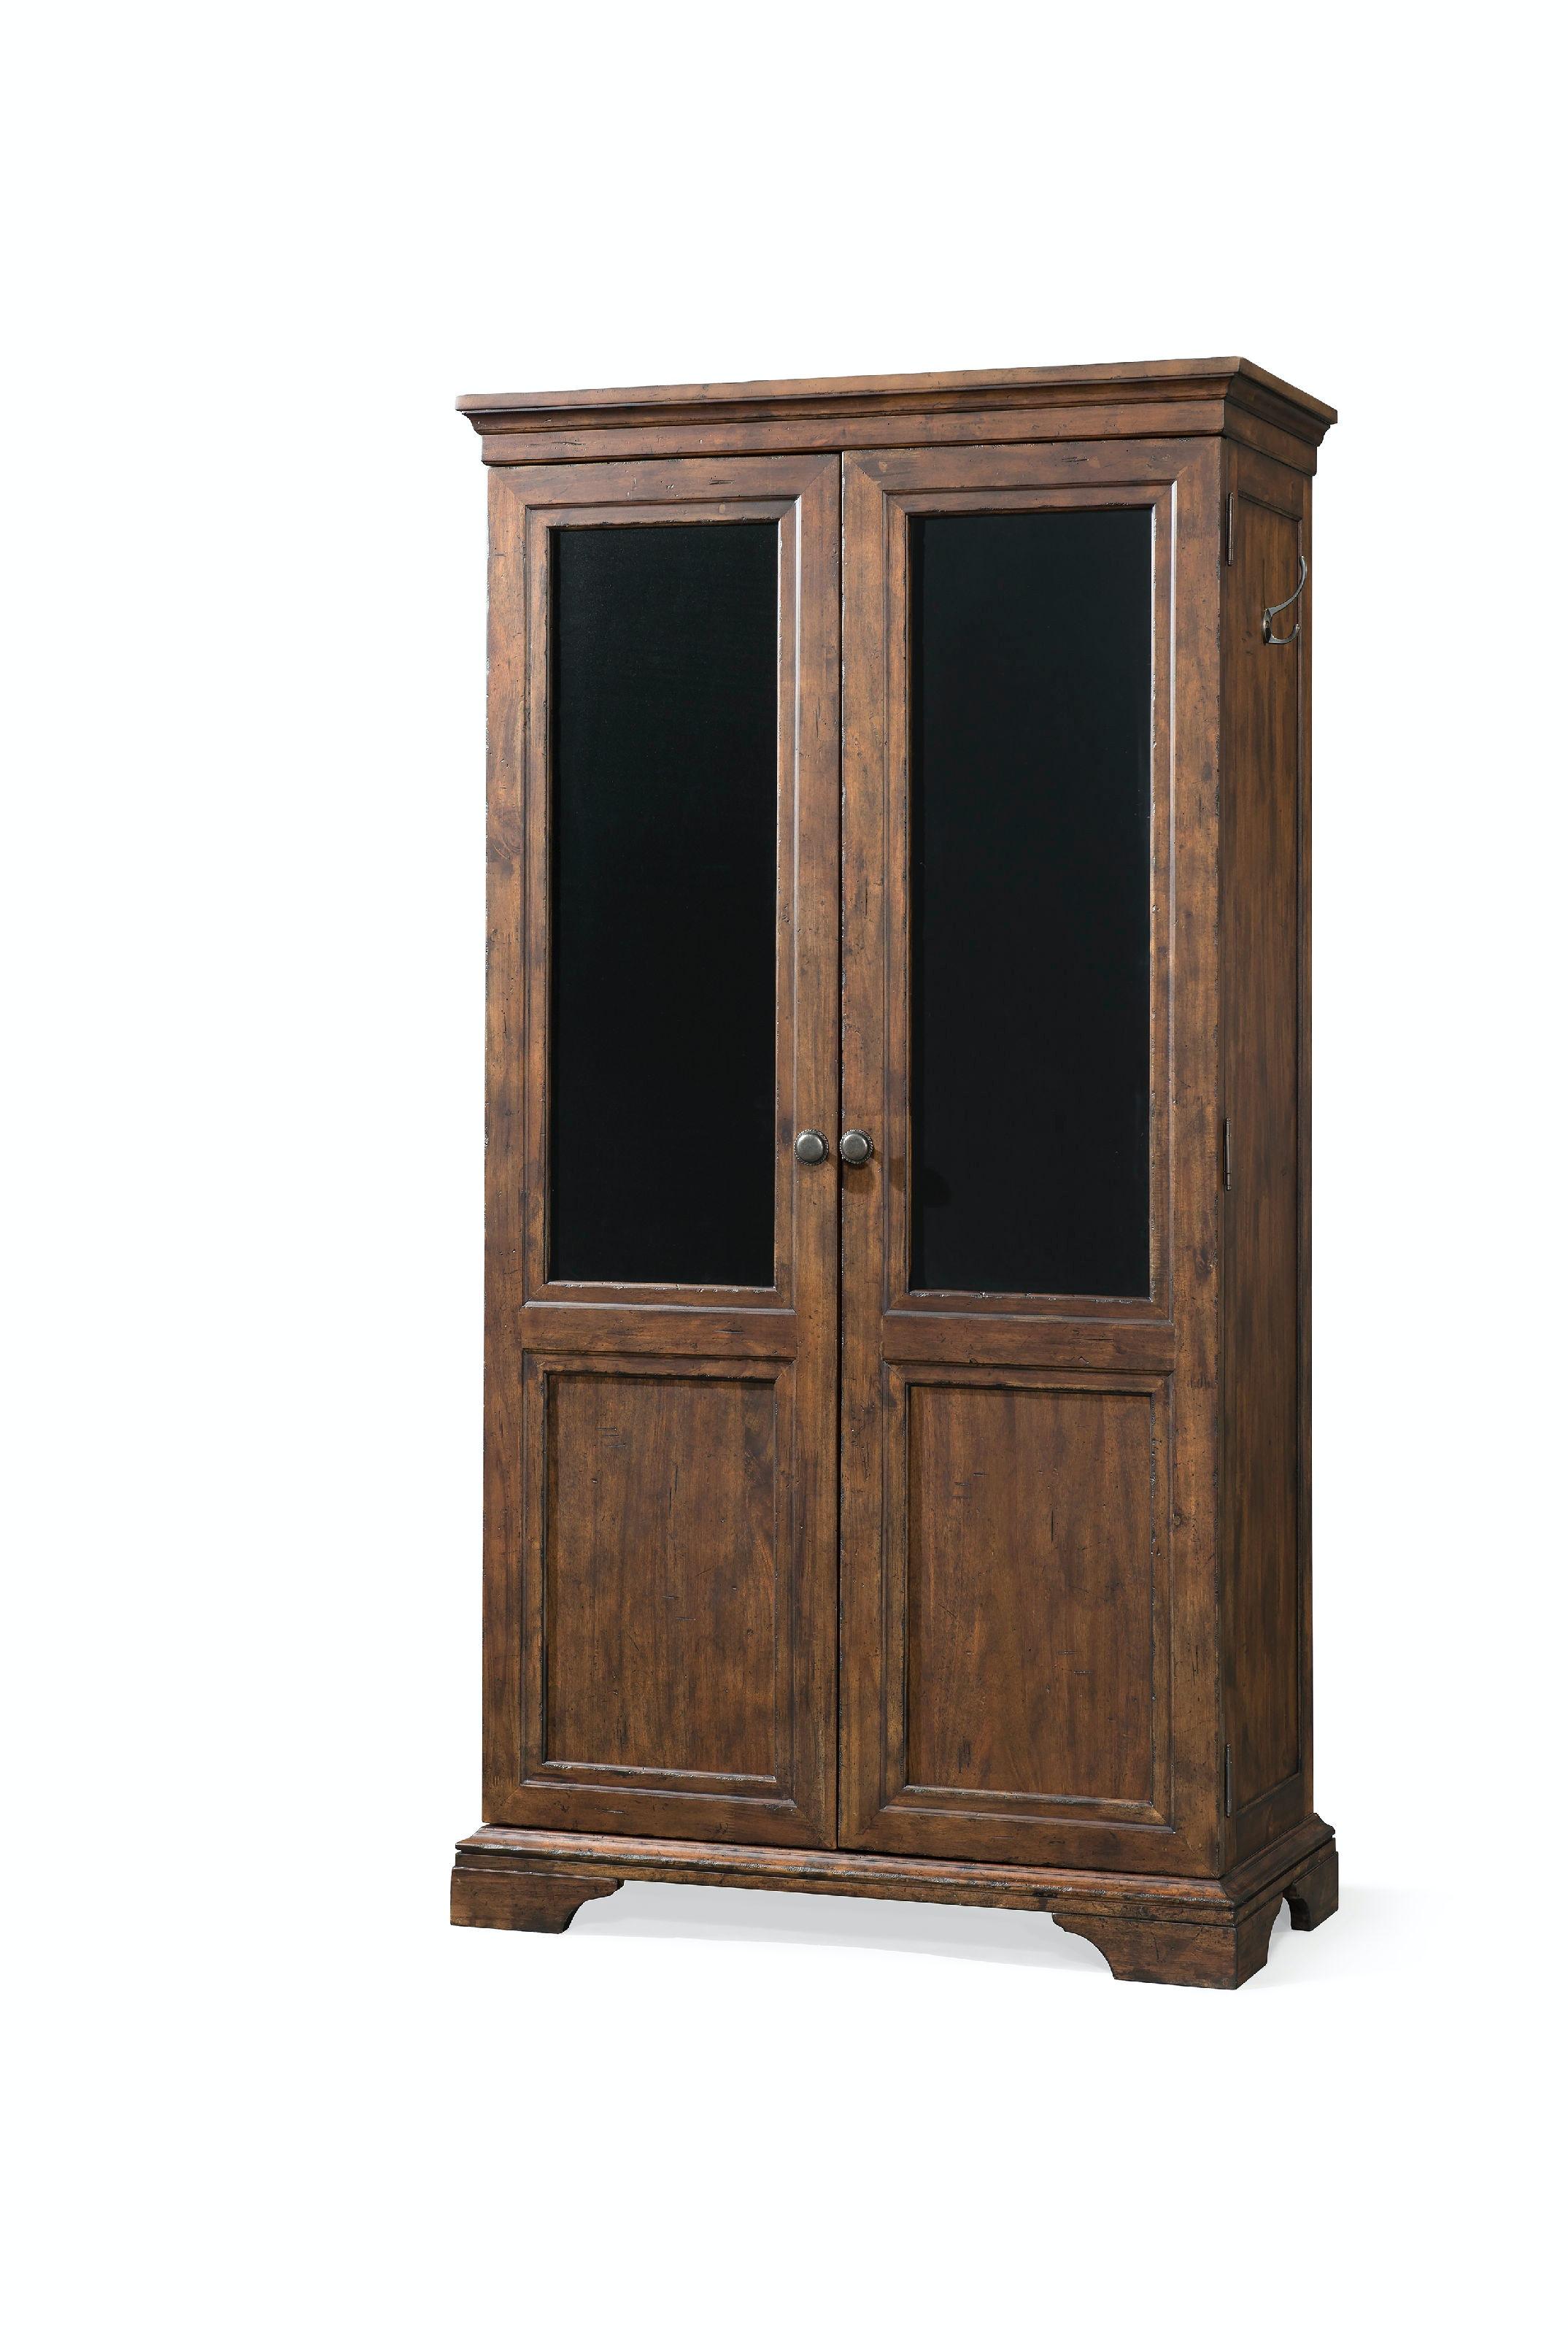 Trisha Yearwood Walk Away Joe Cabinet 920 470 CABI